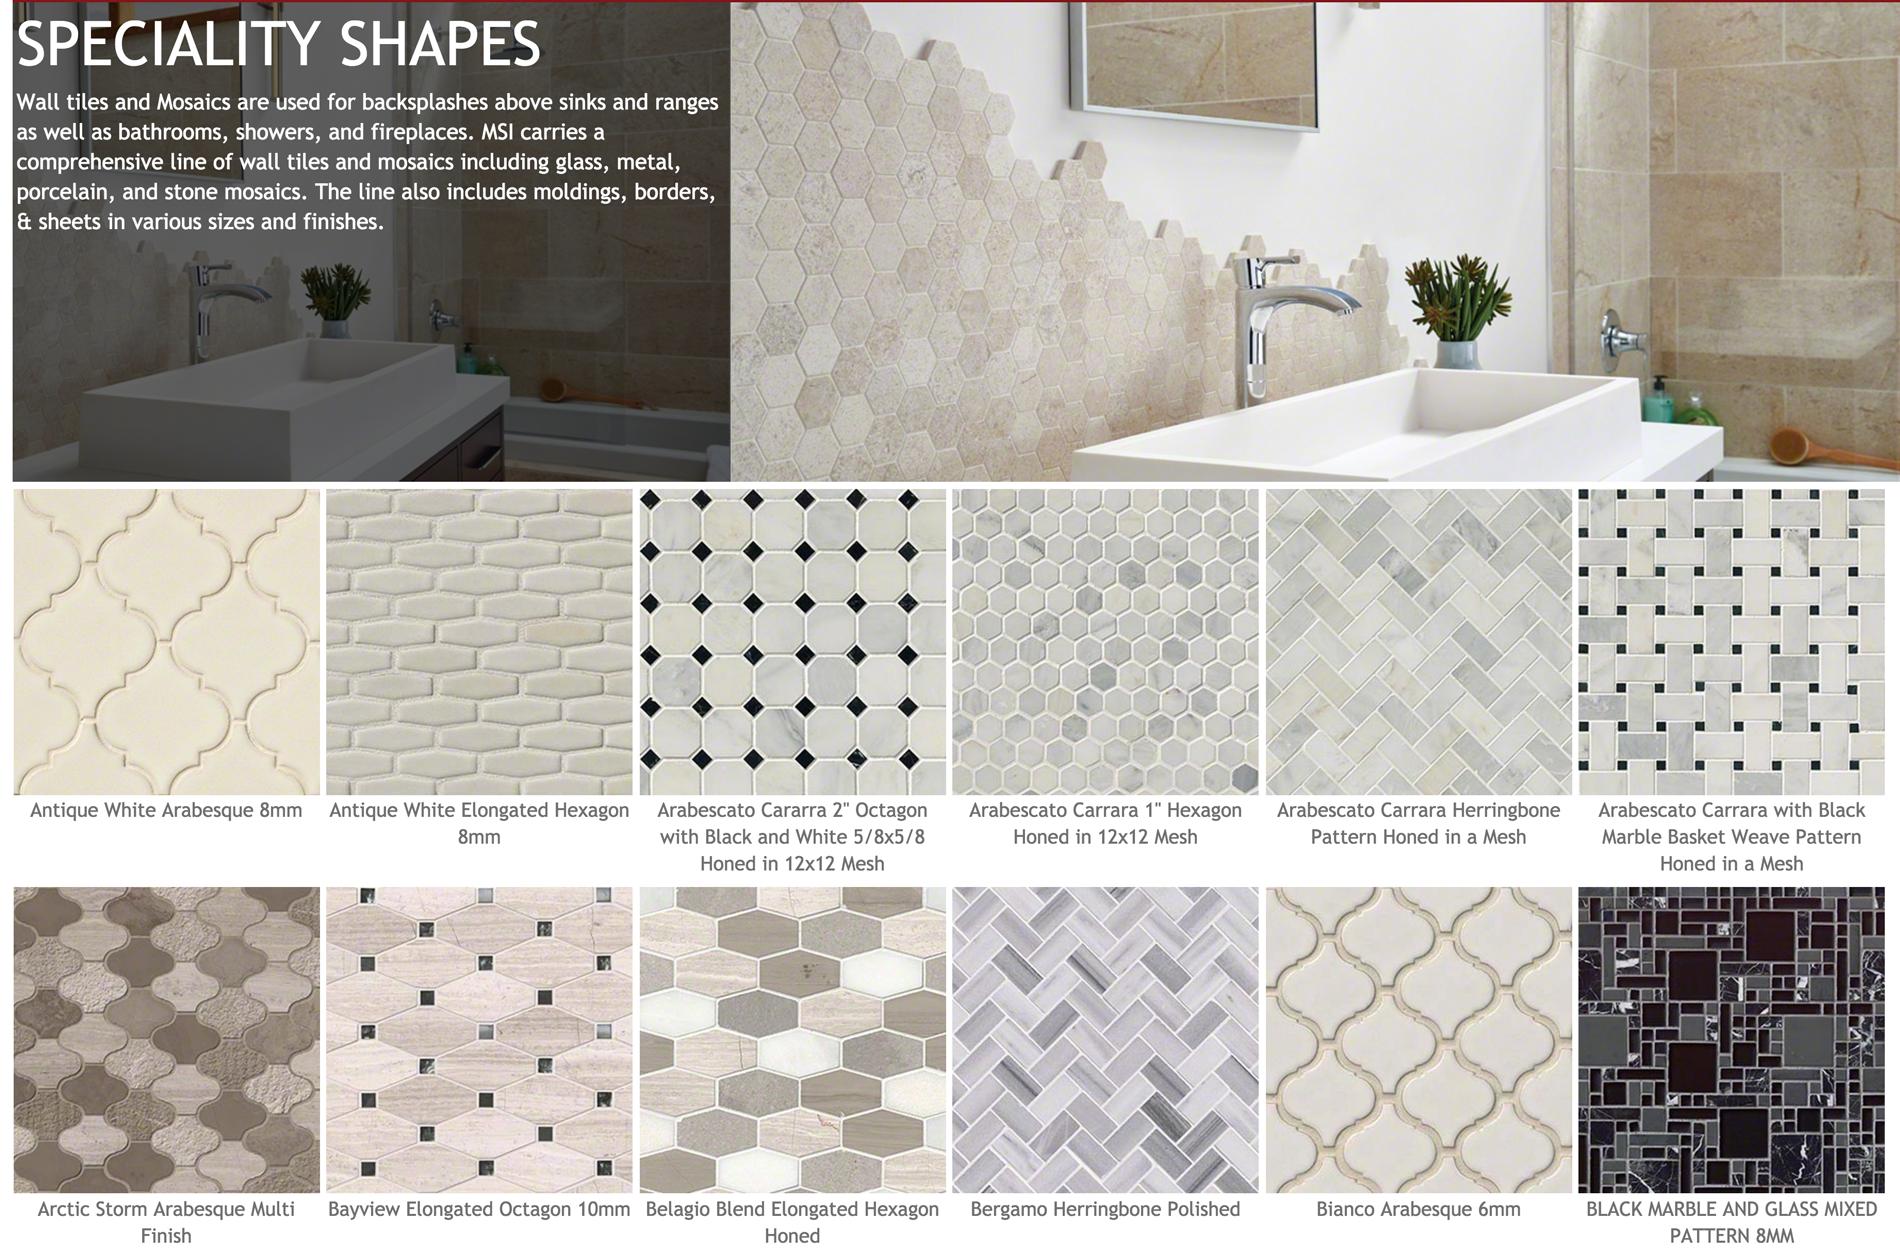 M S International, Inc. Updates Decorative Mosaics and Wall Tile ...